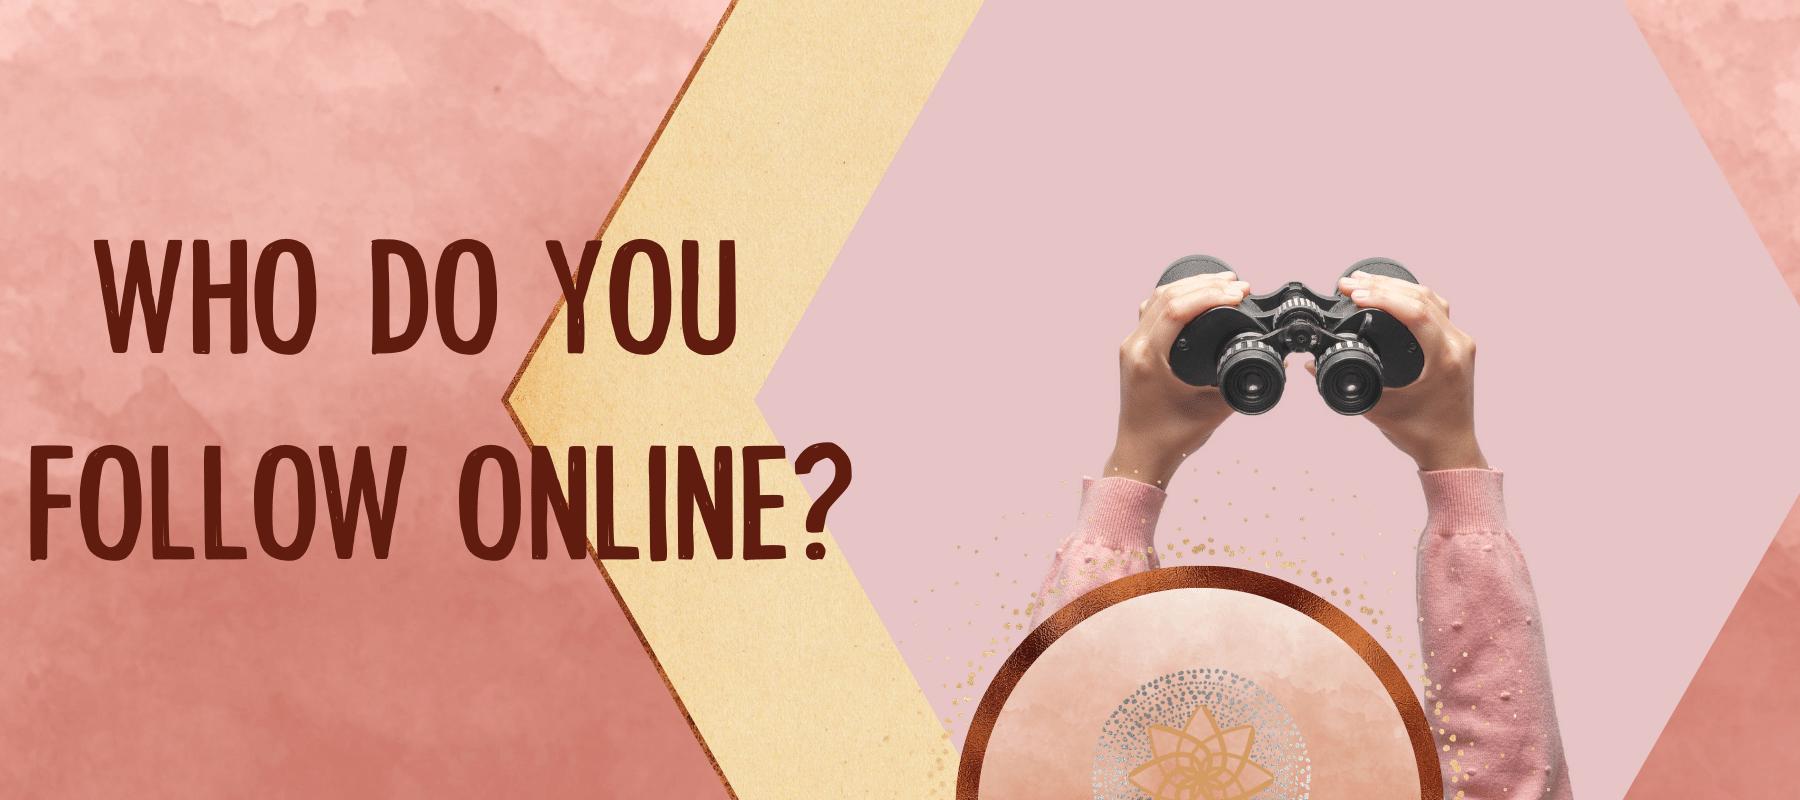 Who Do You Follow Online?